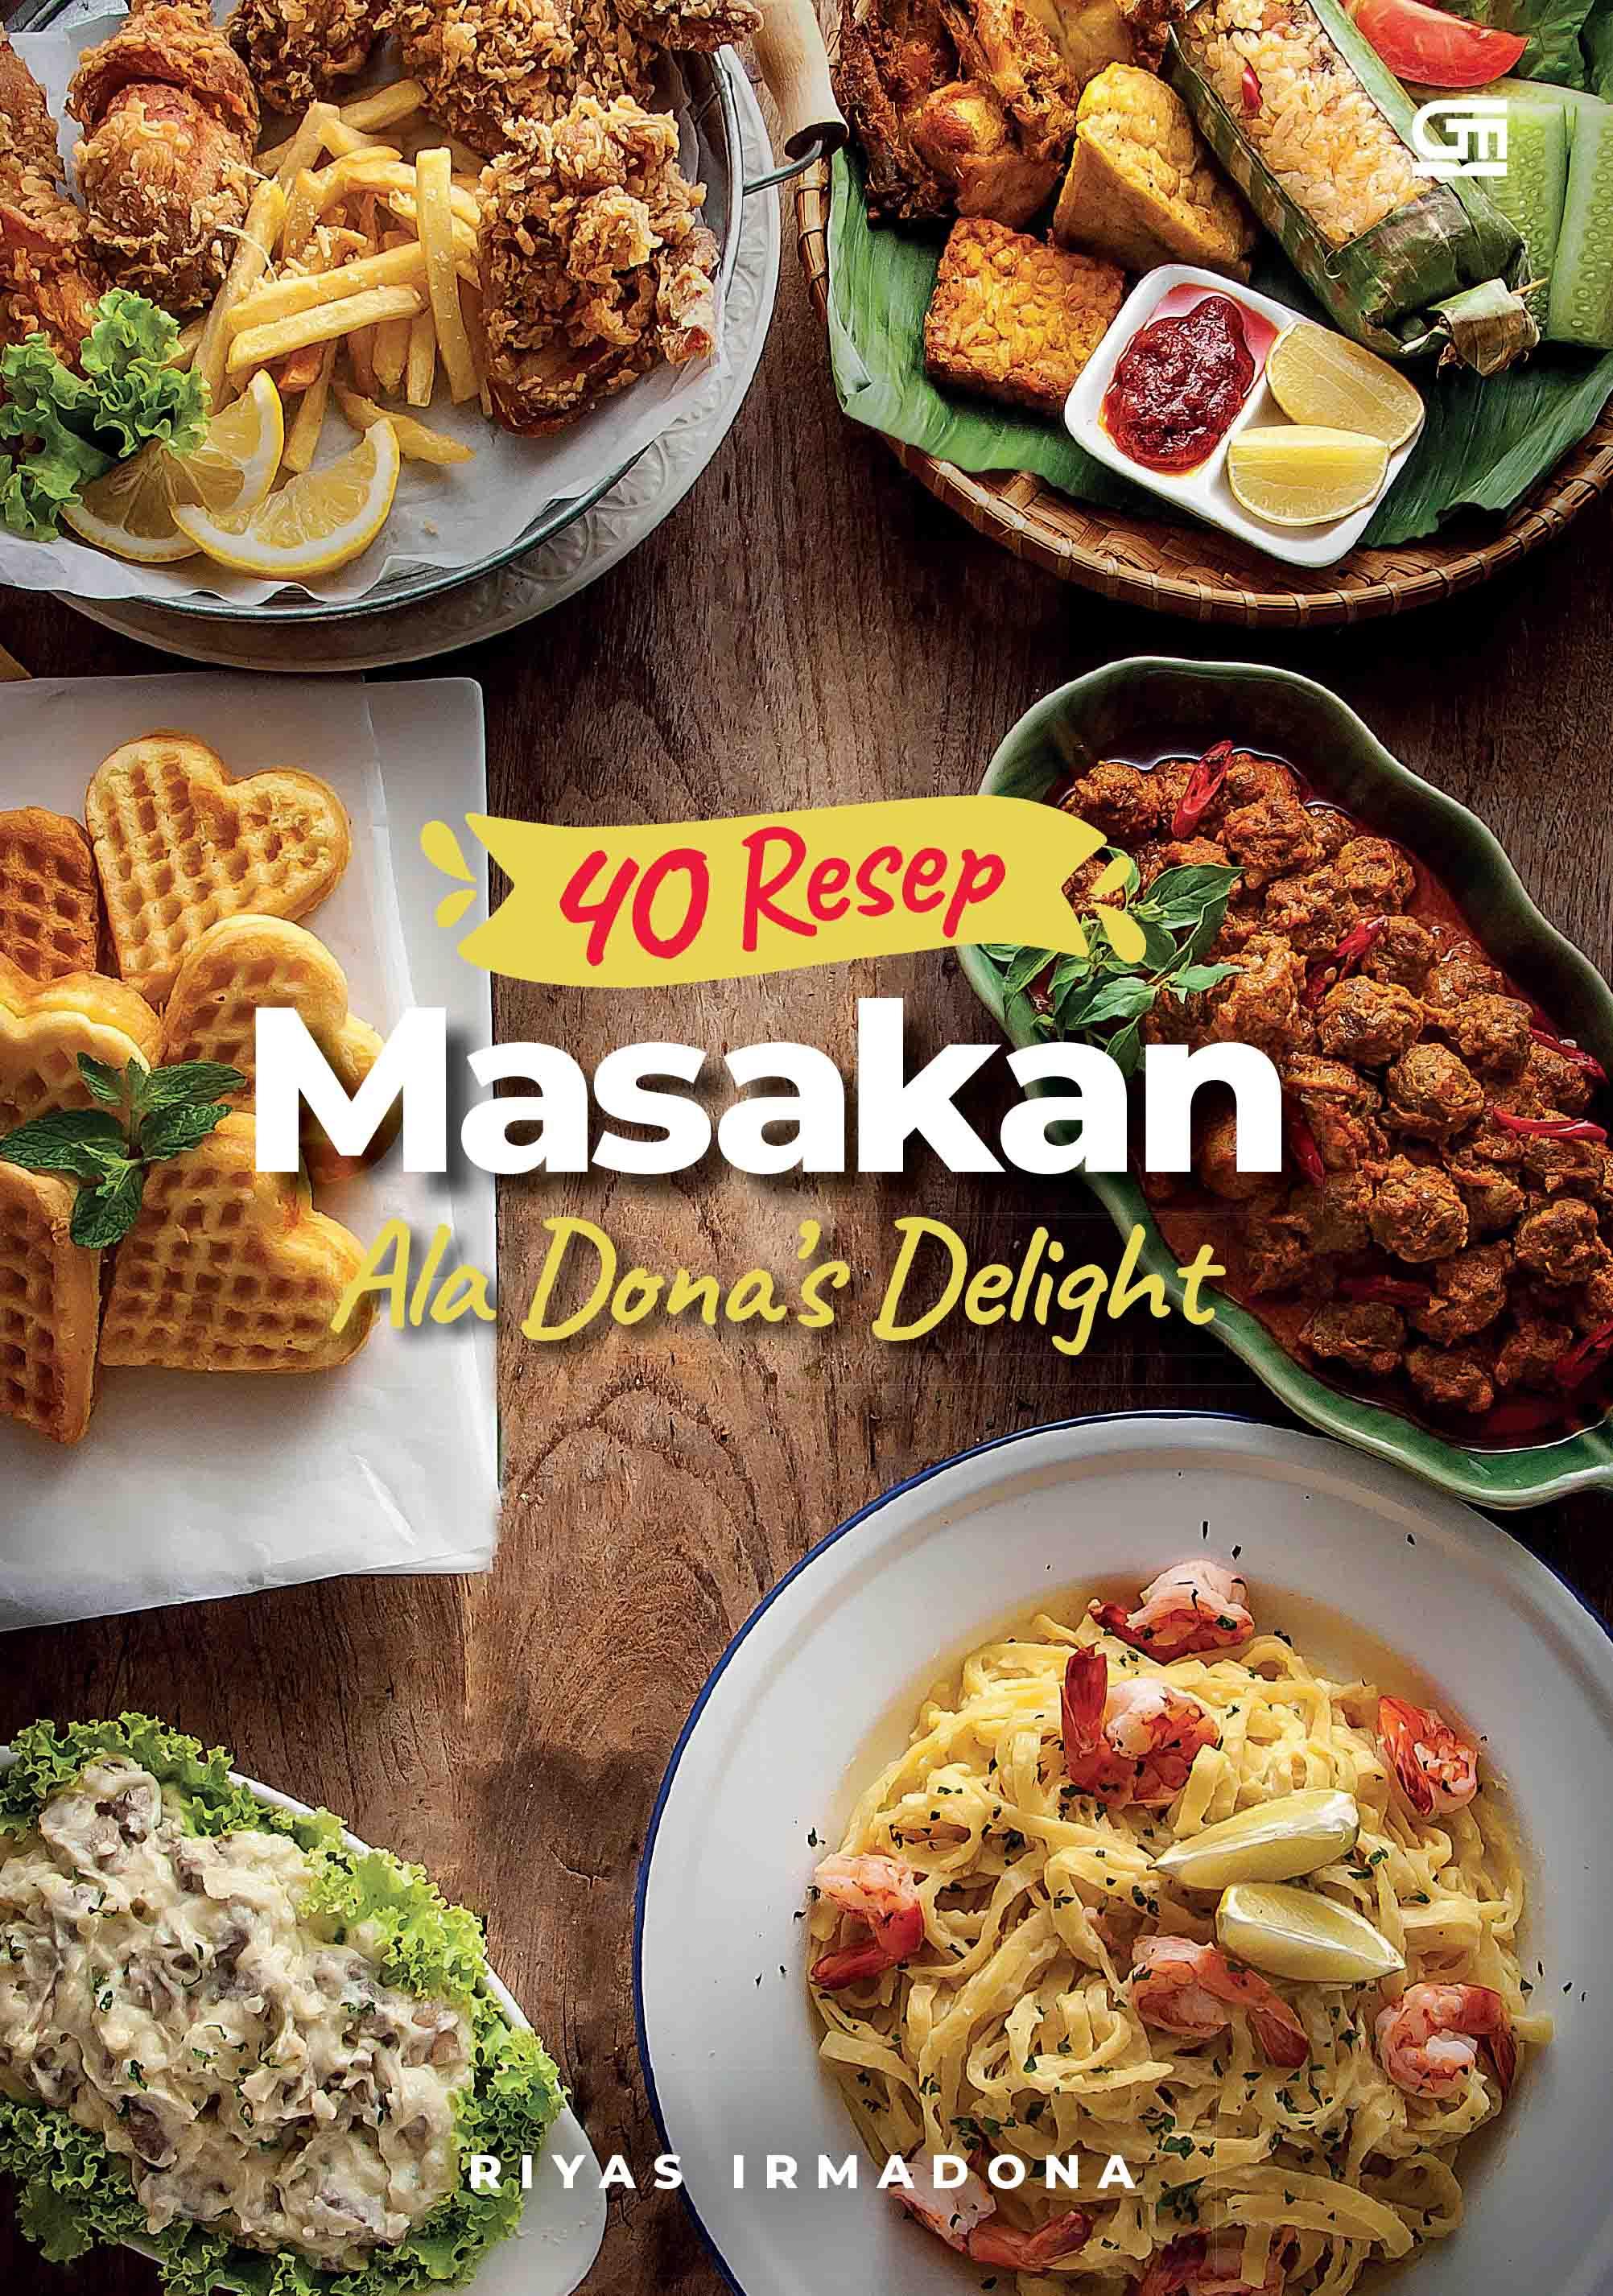 40 Resep Masakan ala Dona\'s Delight